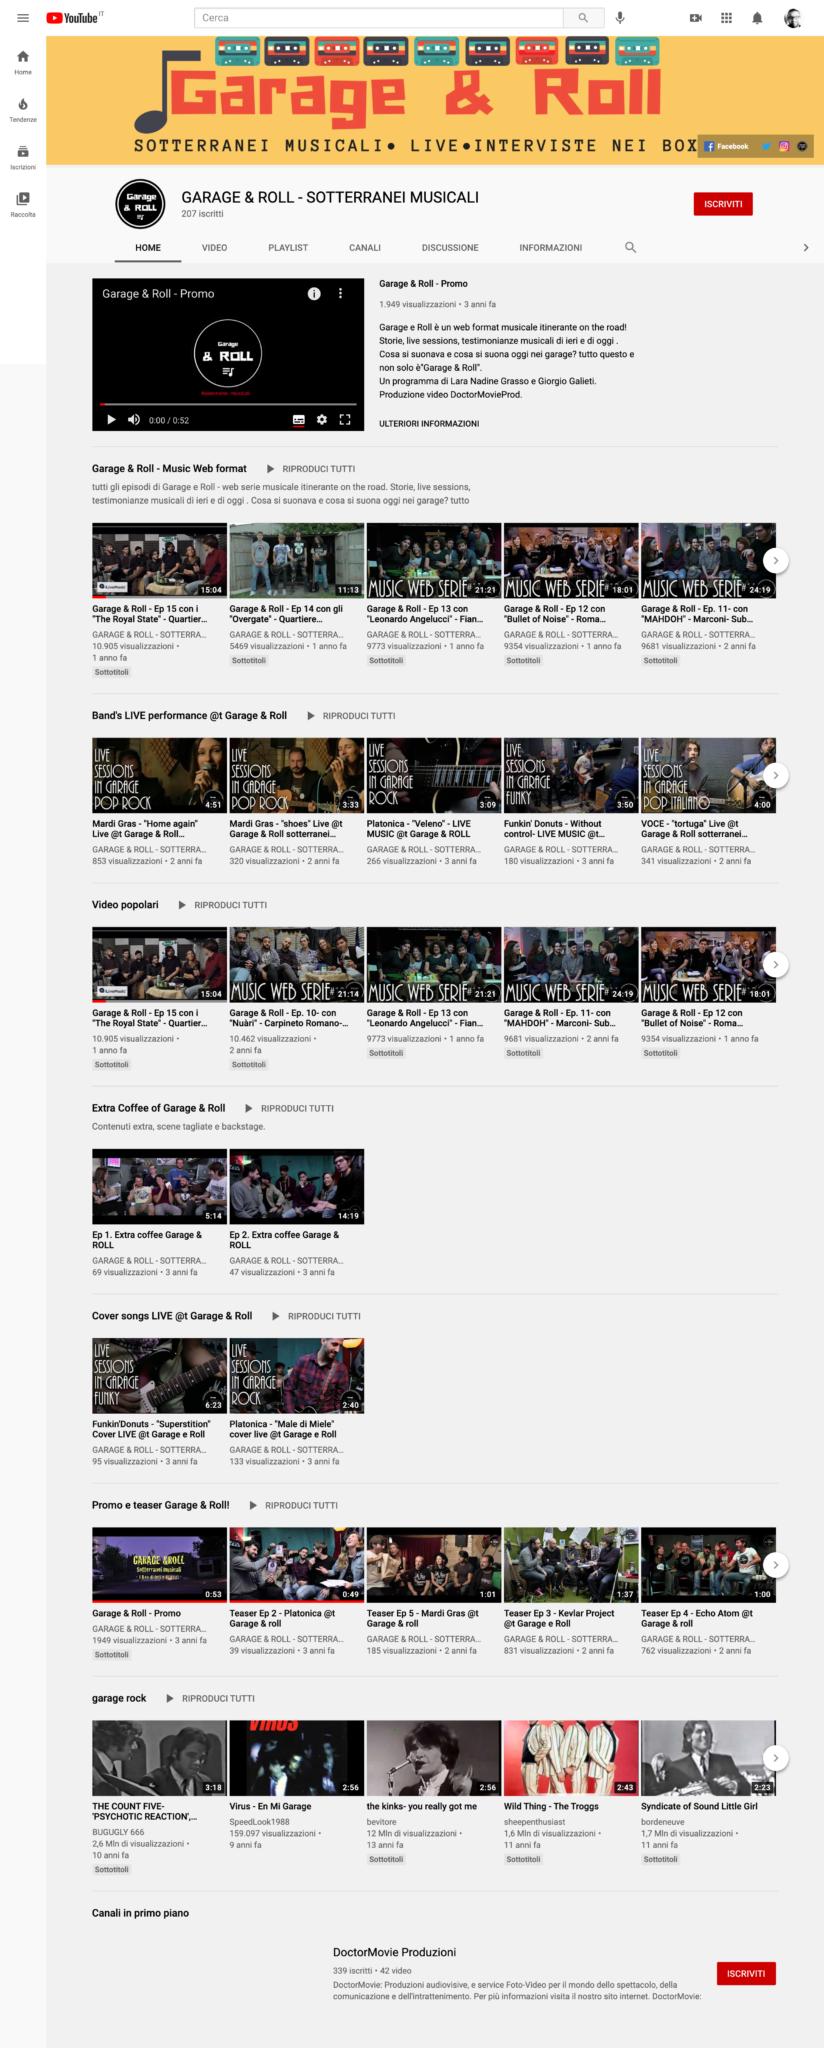 GARAGE & ROLL YouTube